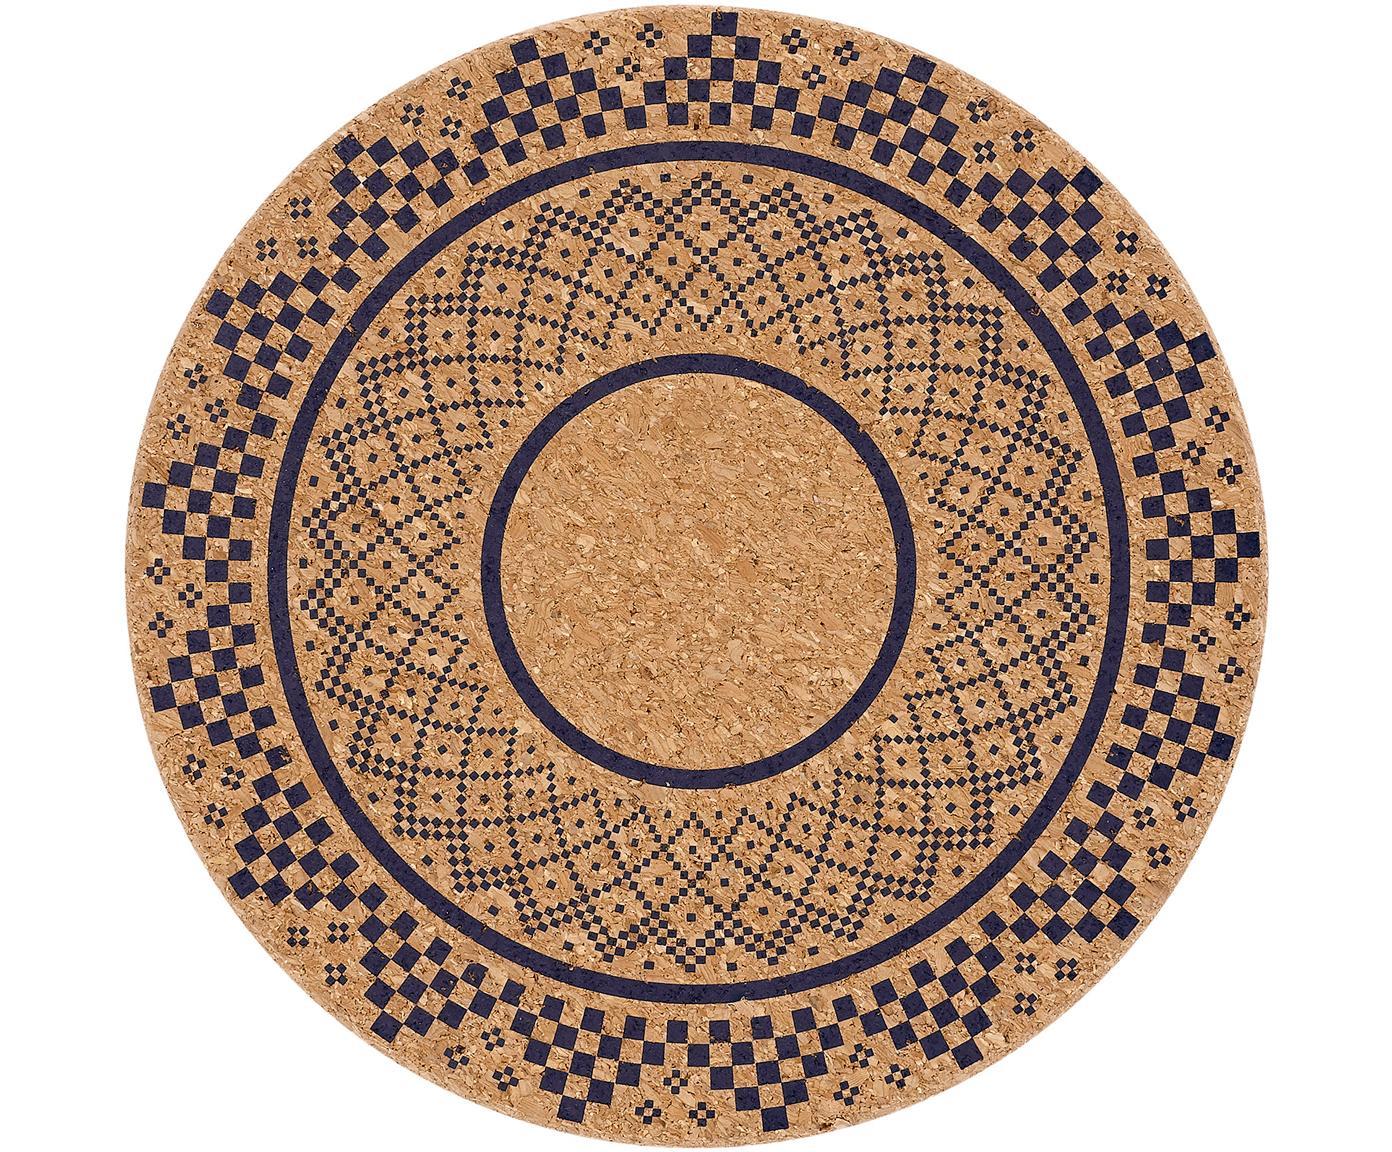 Gemusterte Kork-Topfuntersetzer Arise, 2 Stück, Kork, Kork, Dunkelblau, Ø 20 x H 2 cm